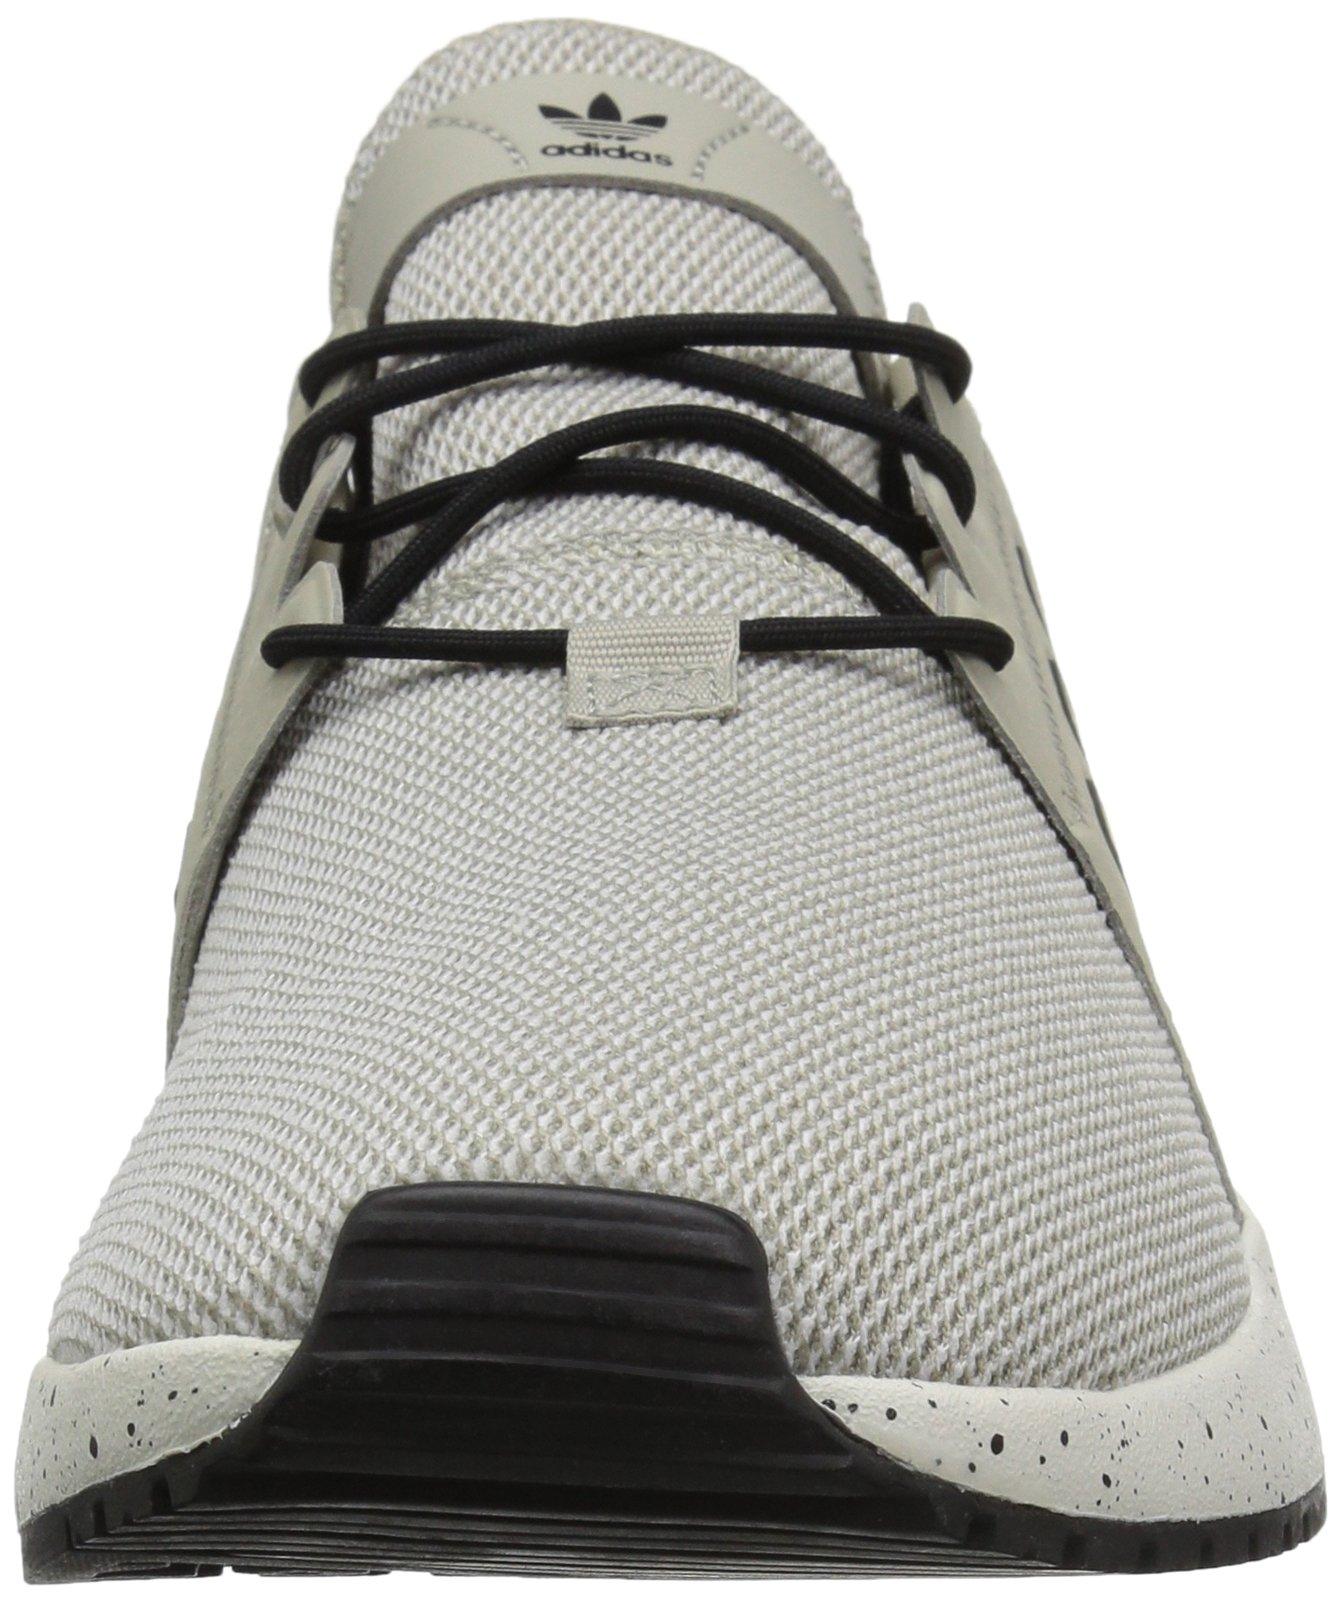 adidas Originals Mens X_PLR Running Shoe Sneaker Black/Sesame, 4.5 M US by adidas Originals (Image #4)